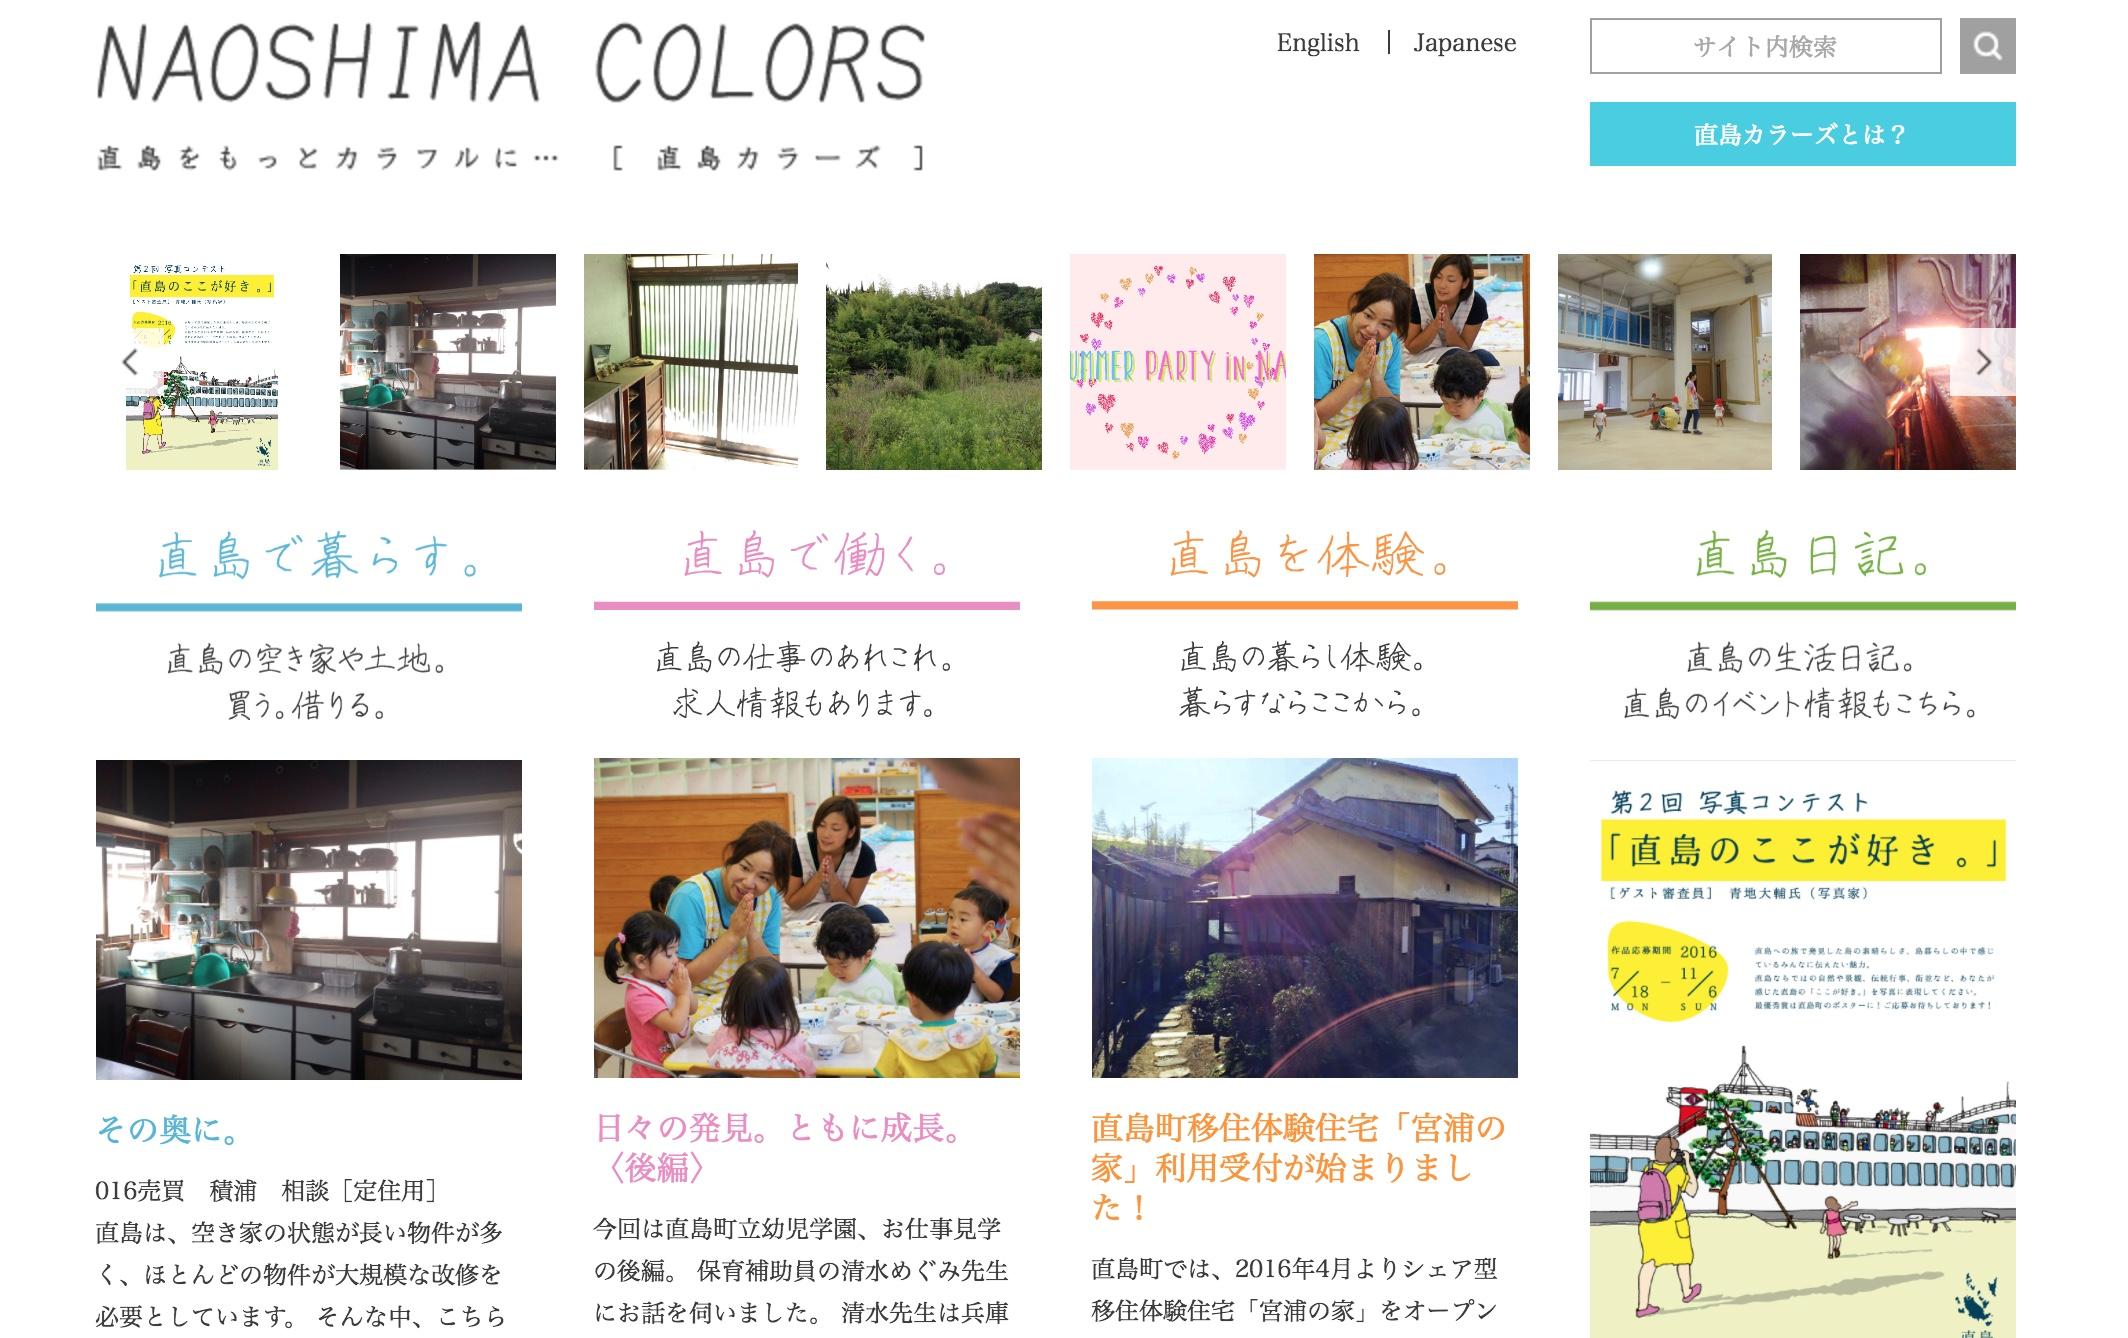 naoshimacolors